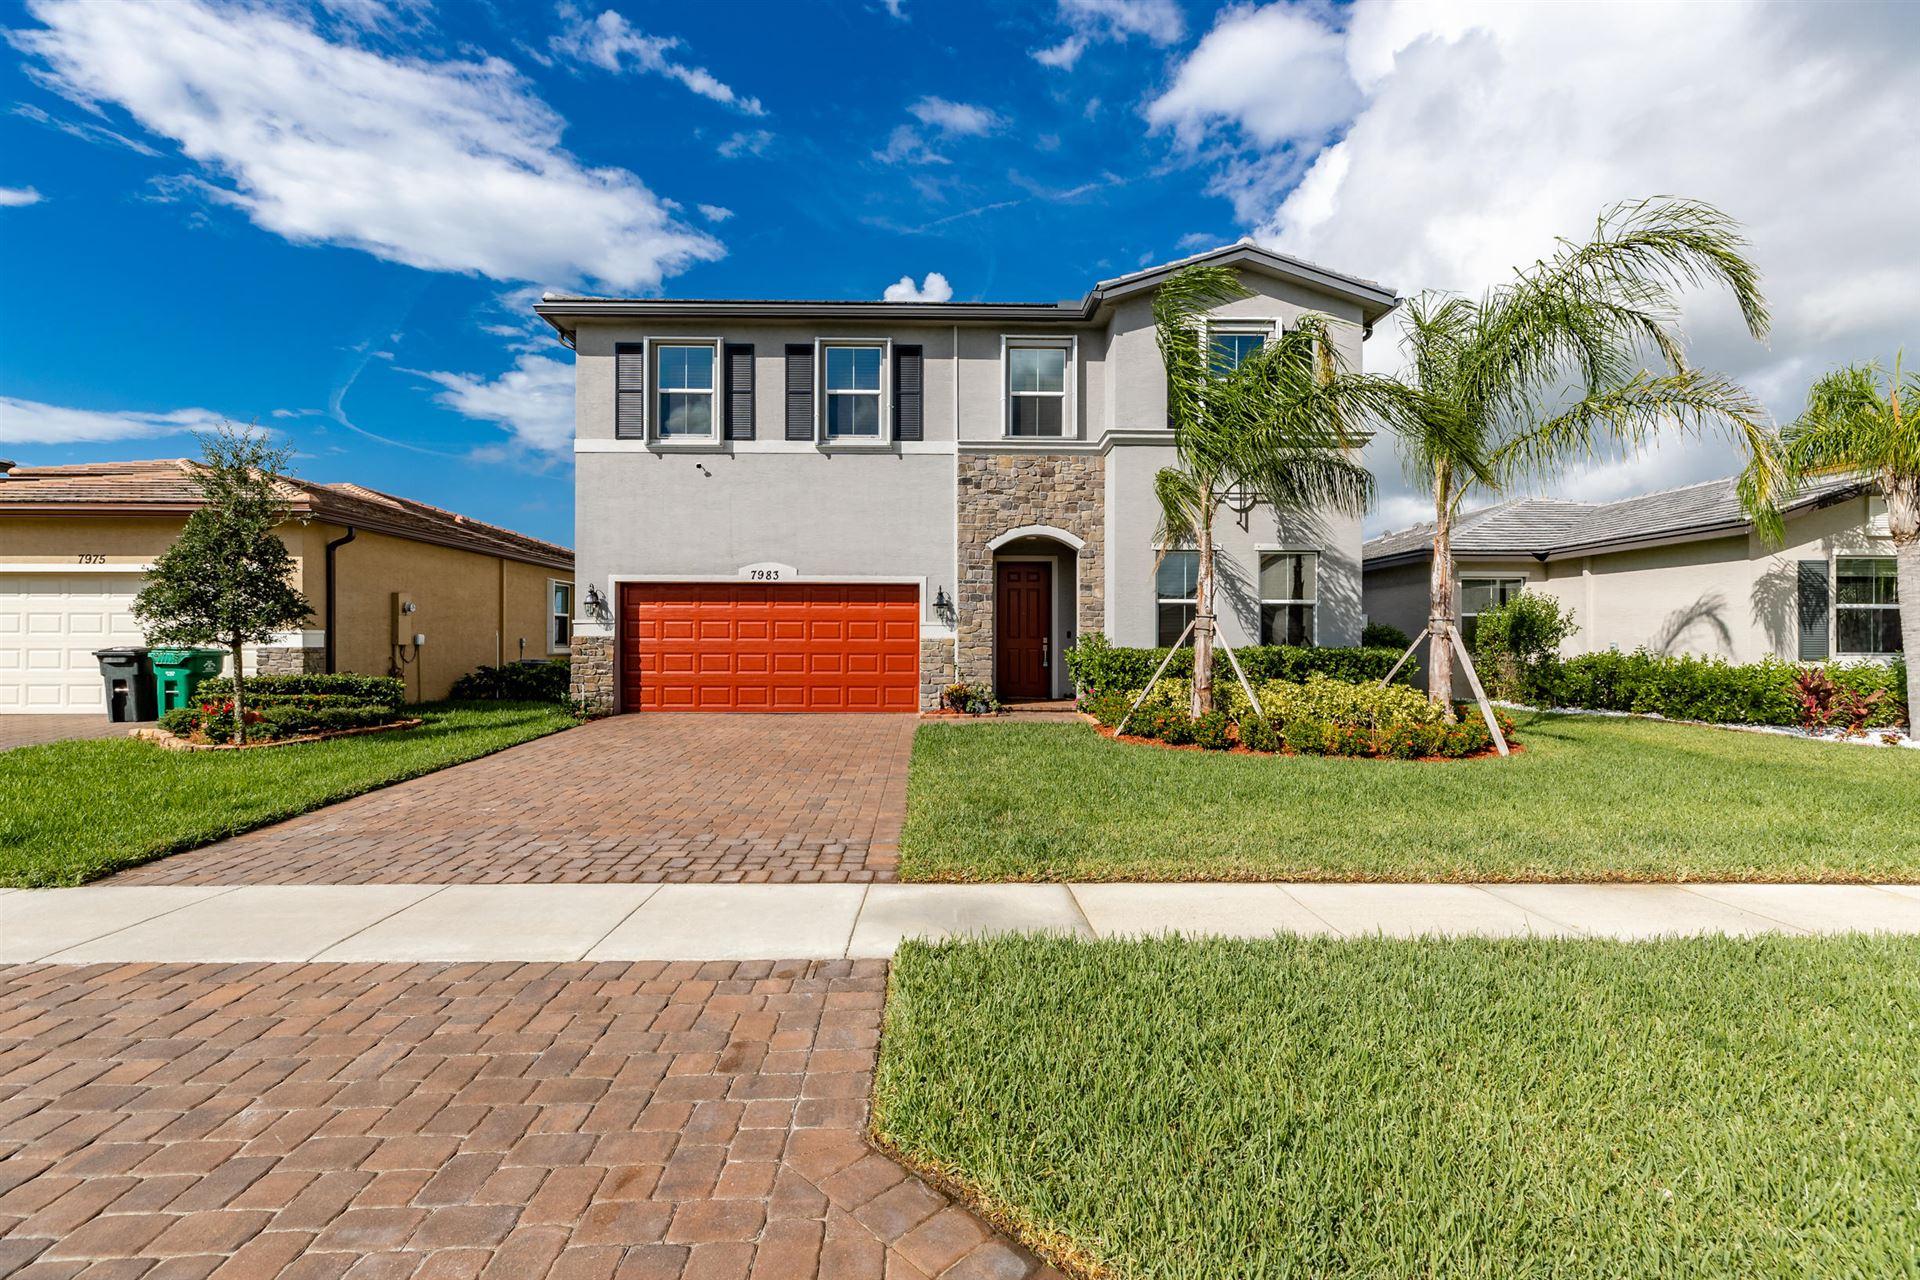 7983 NW Greenbank Circle, Port Saint Lucie, FL 34987 - MLS#: RX-10737496